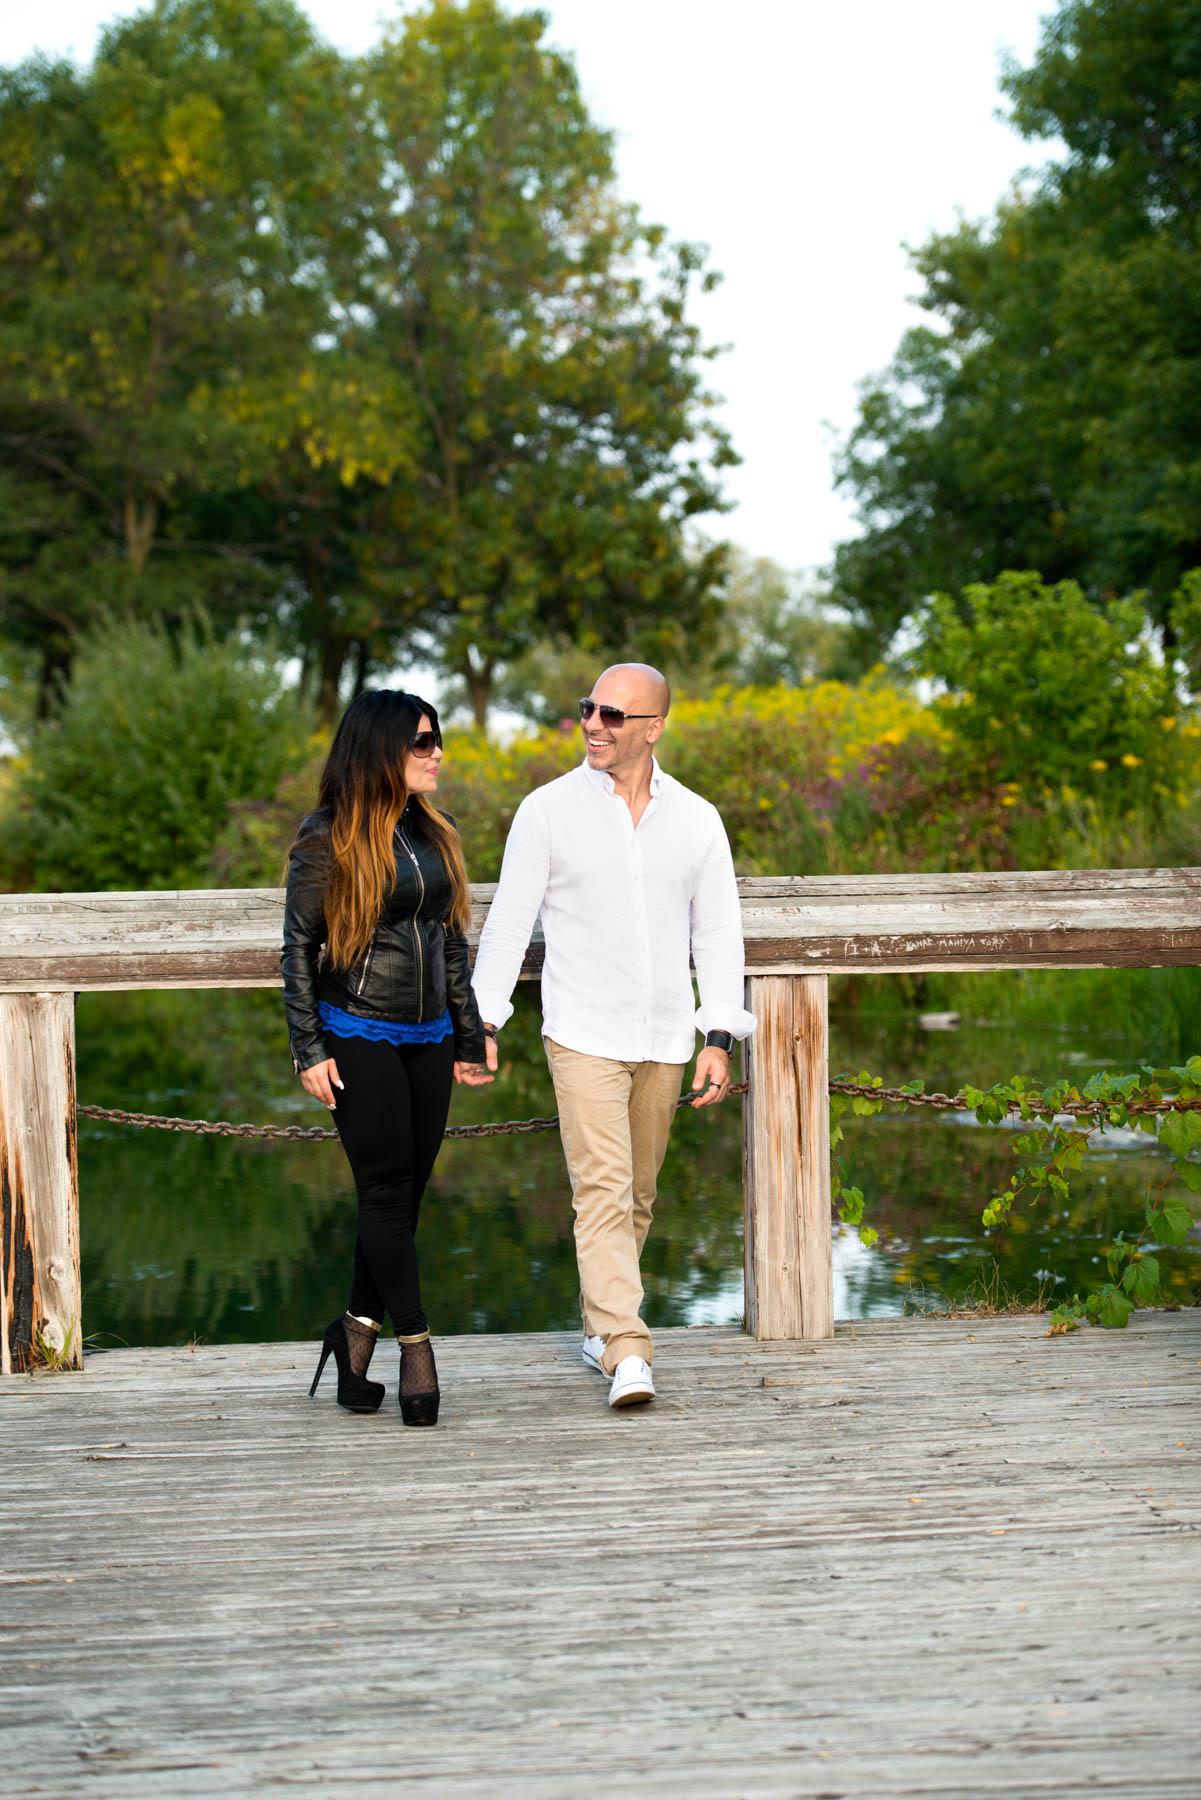 034 - Engagement FL Humber Bay Park - Toronto